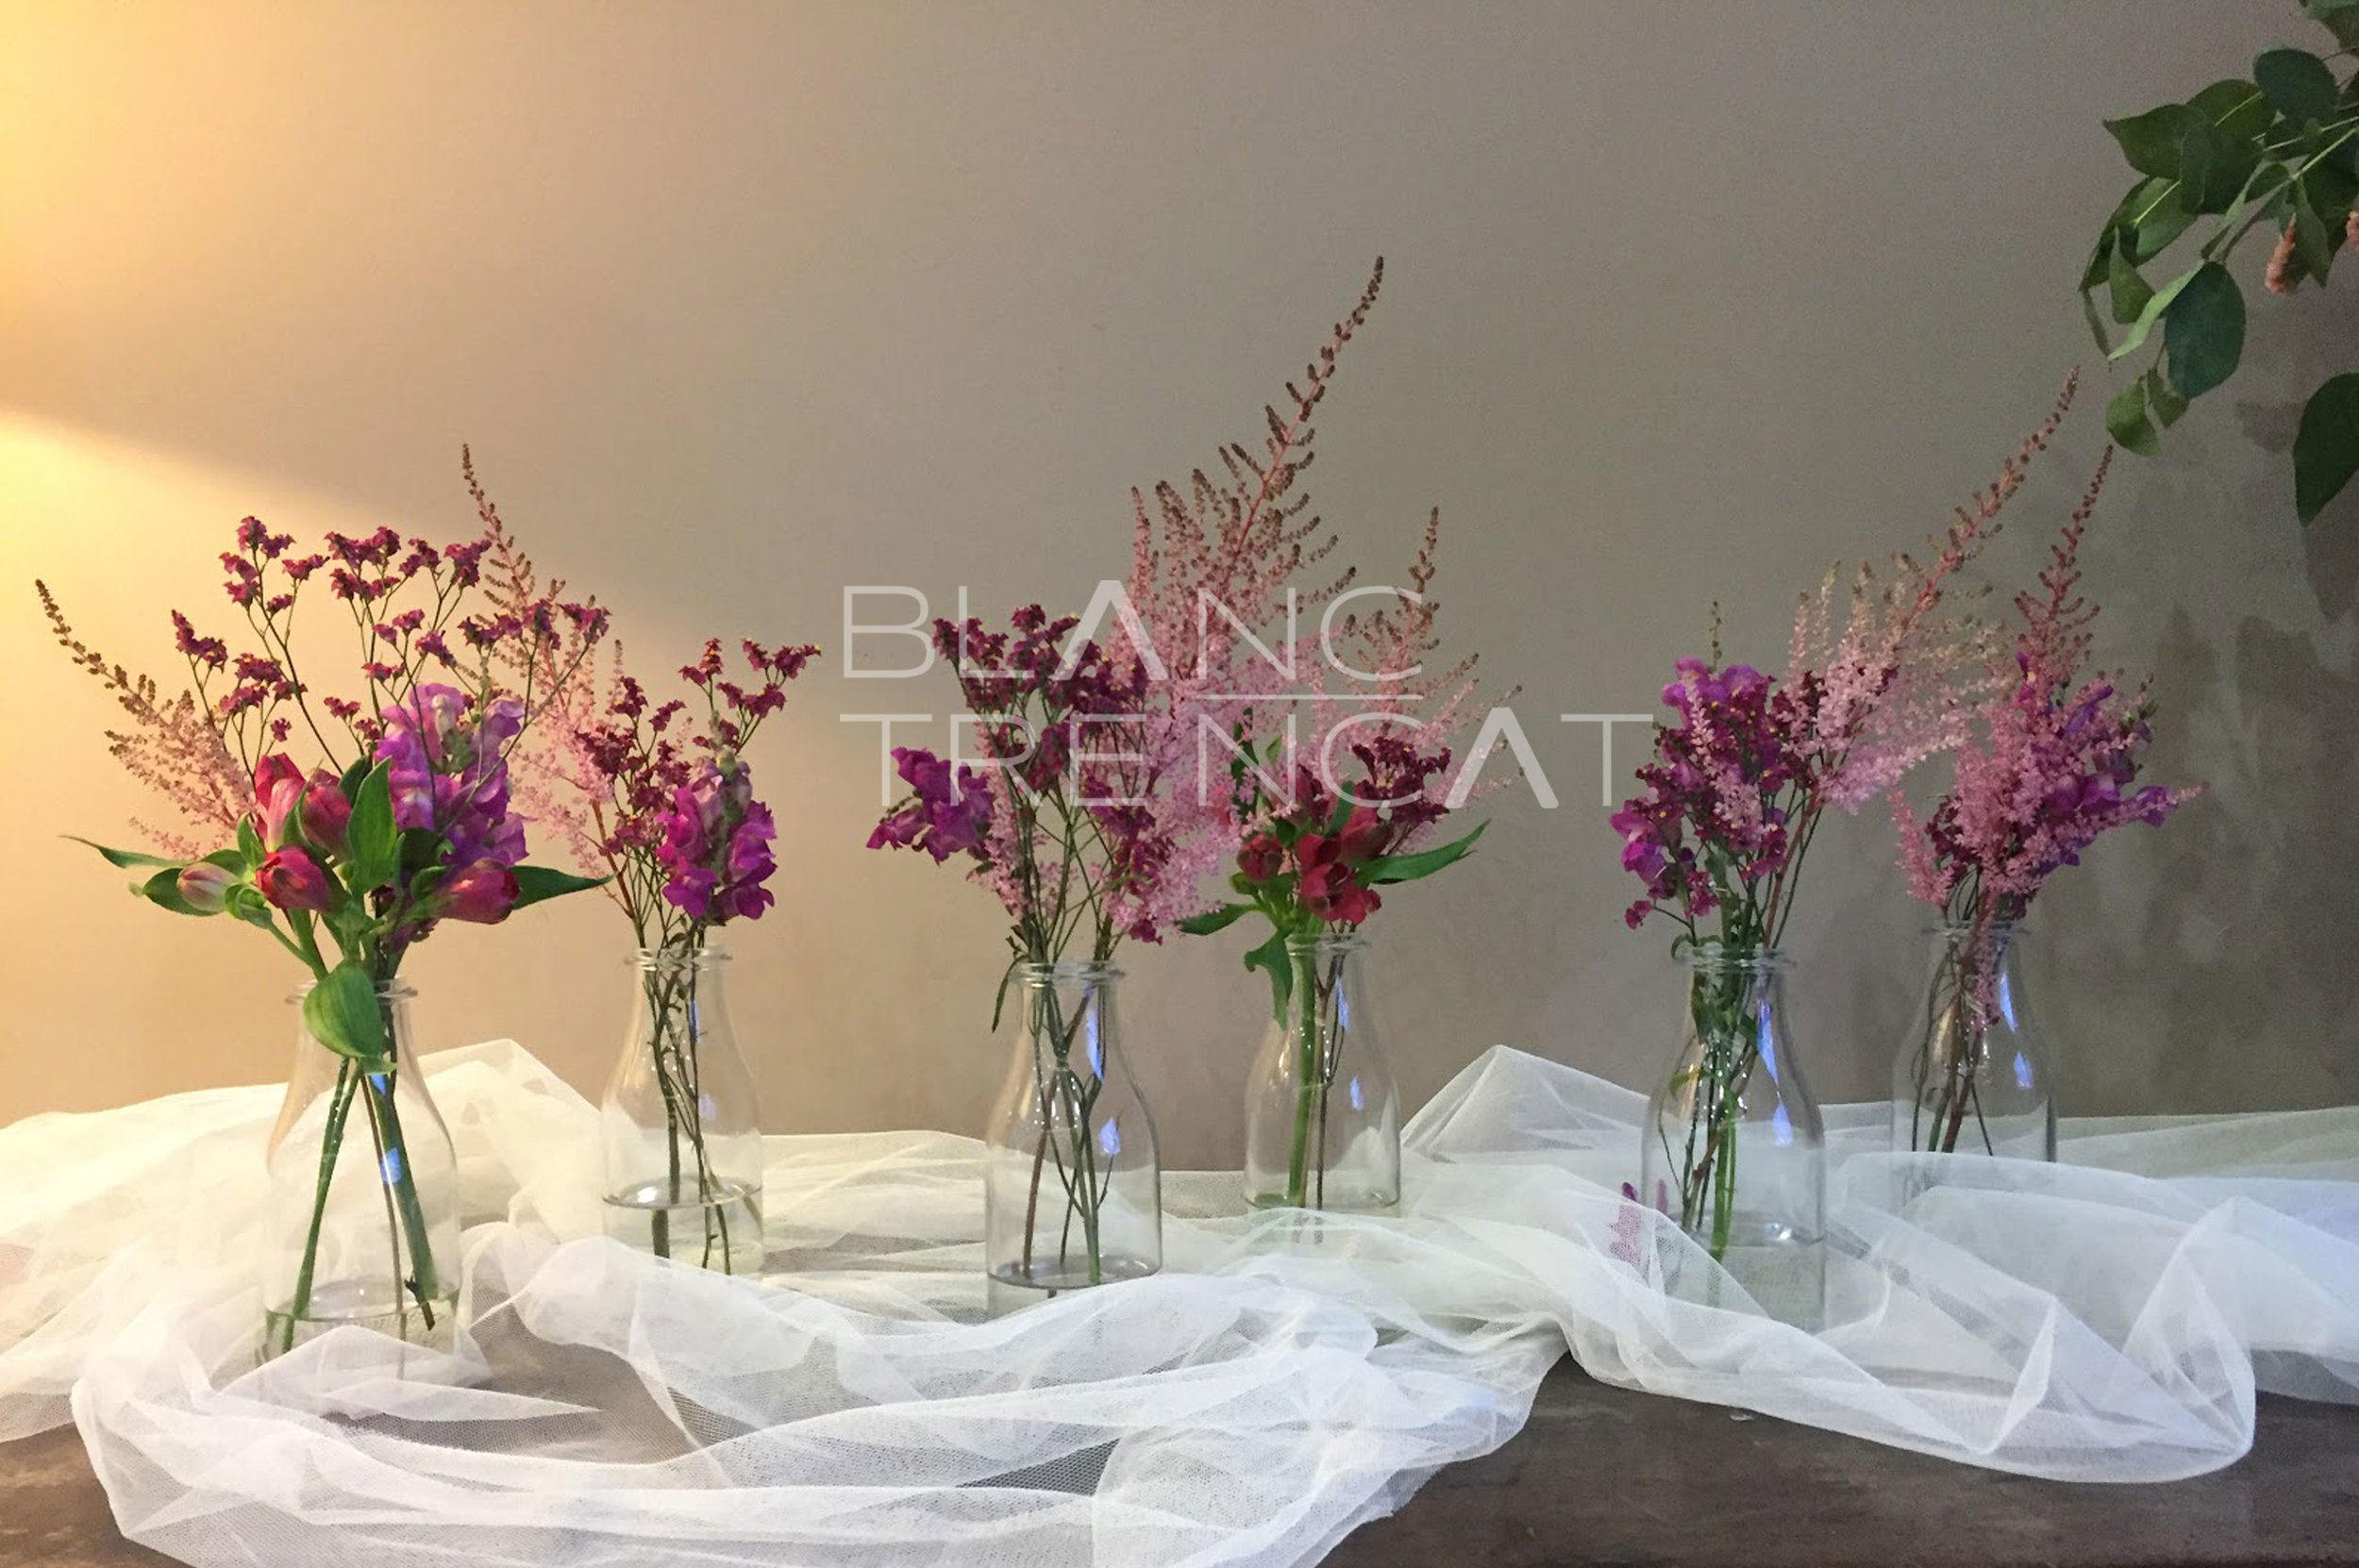 decoracion-boda-blanctrencat-10.jpg